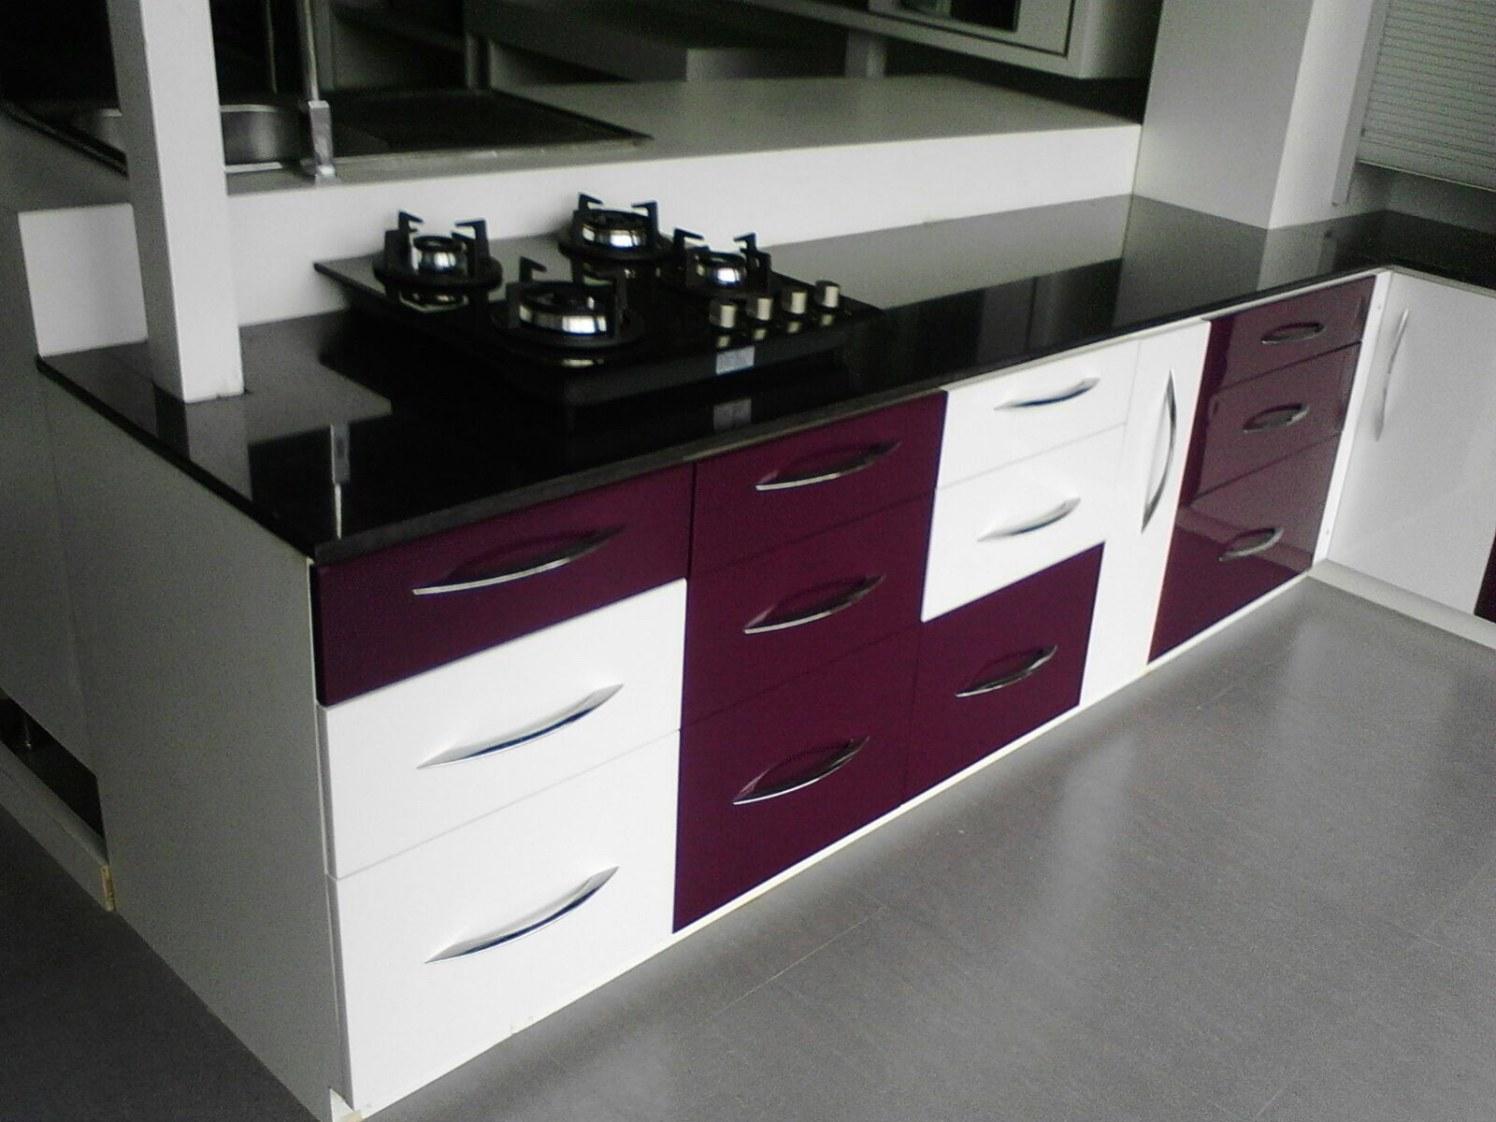 Modular kitchen decor by Jacons Building Technologies  Modular-kitchen Modern | Interior Design Photos & Ideas